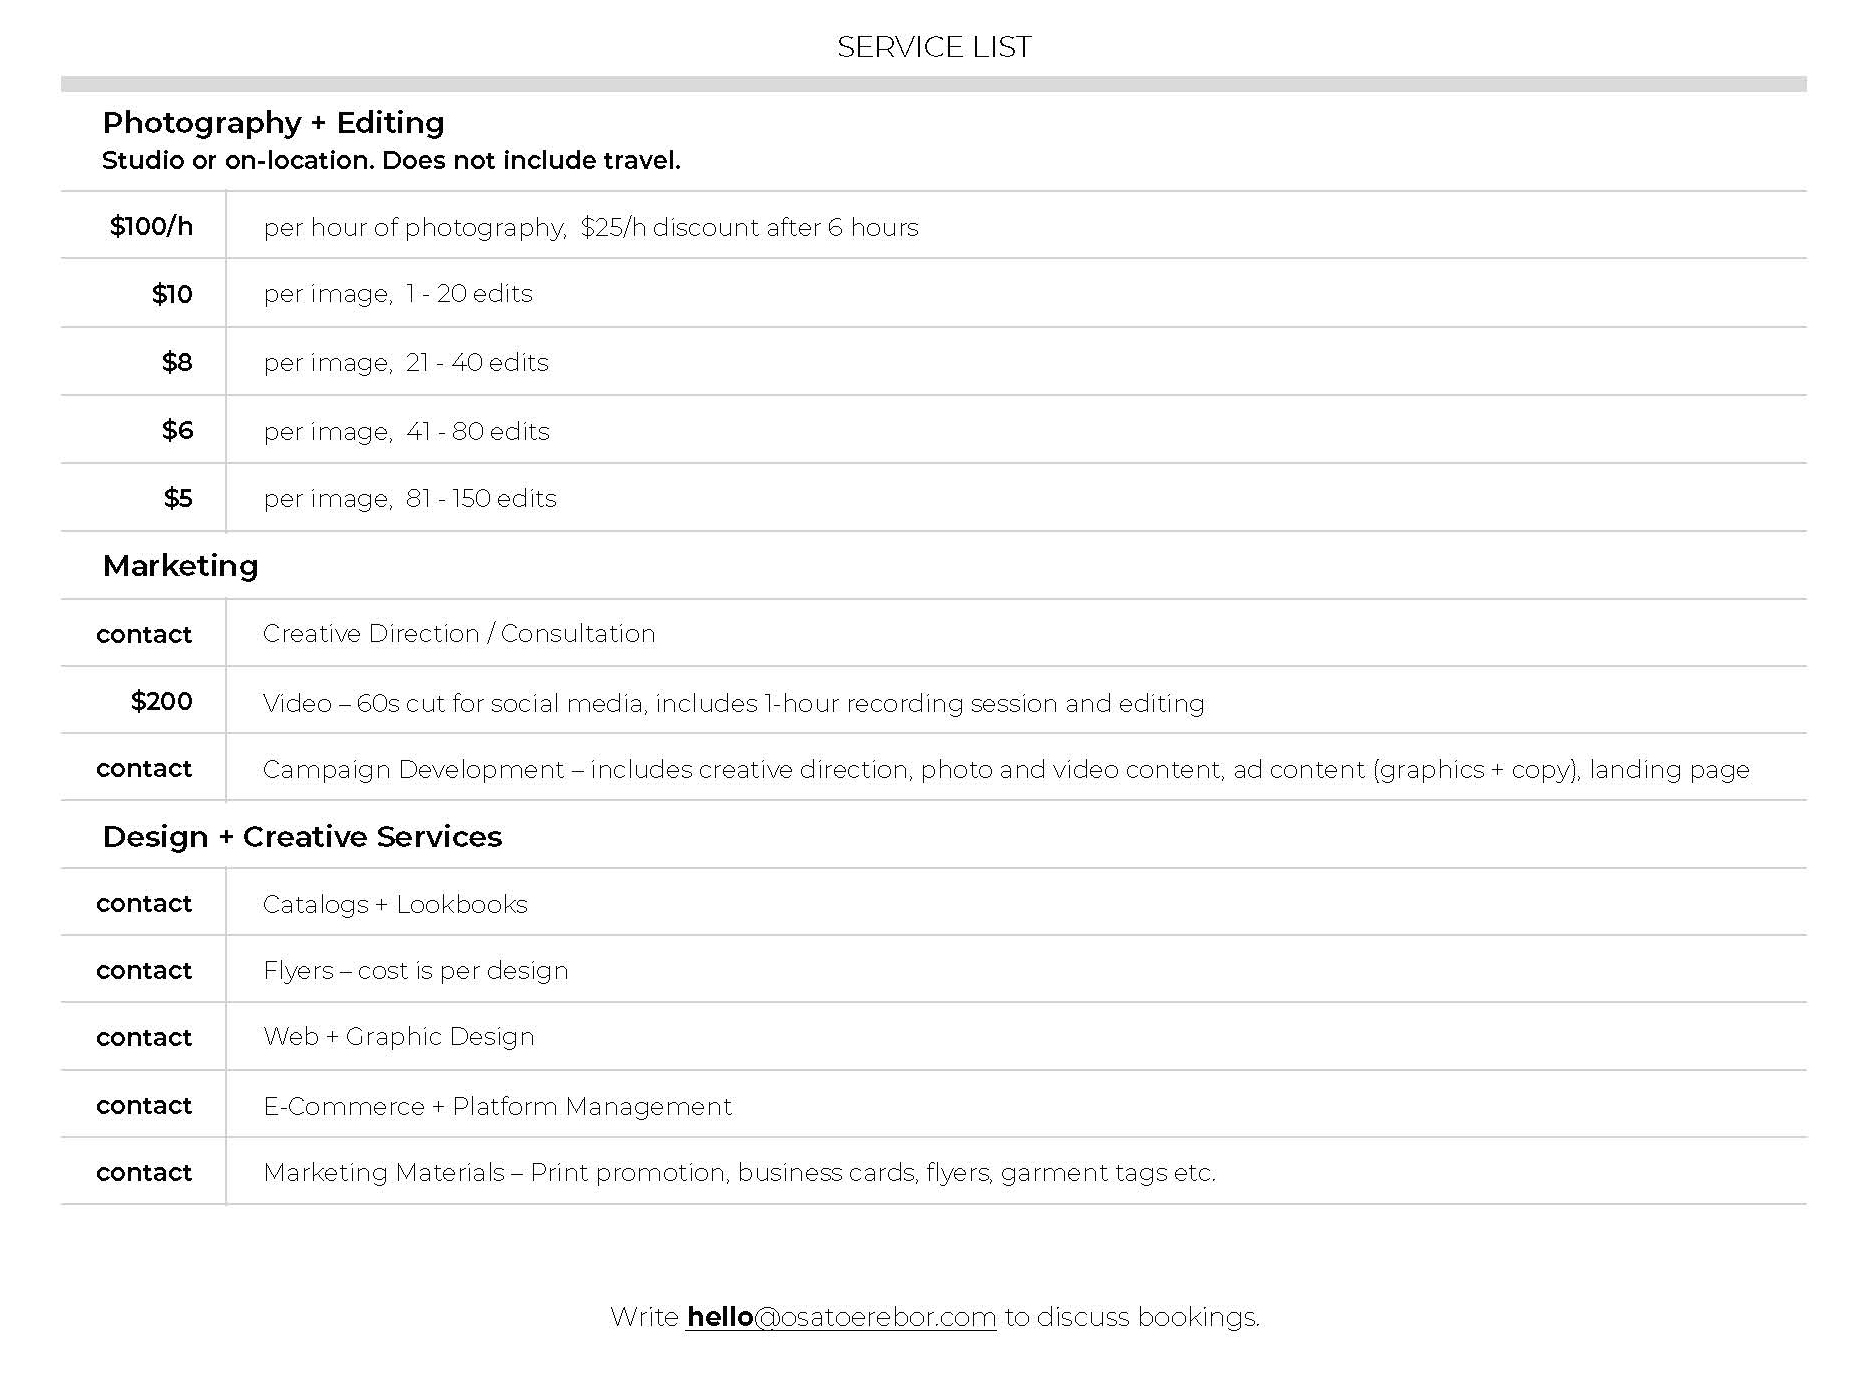 OE Service List - 062019.jpg